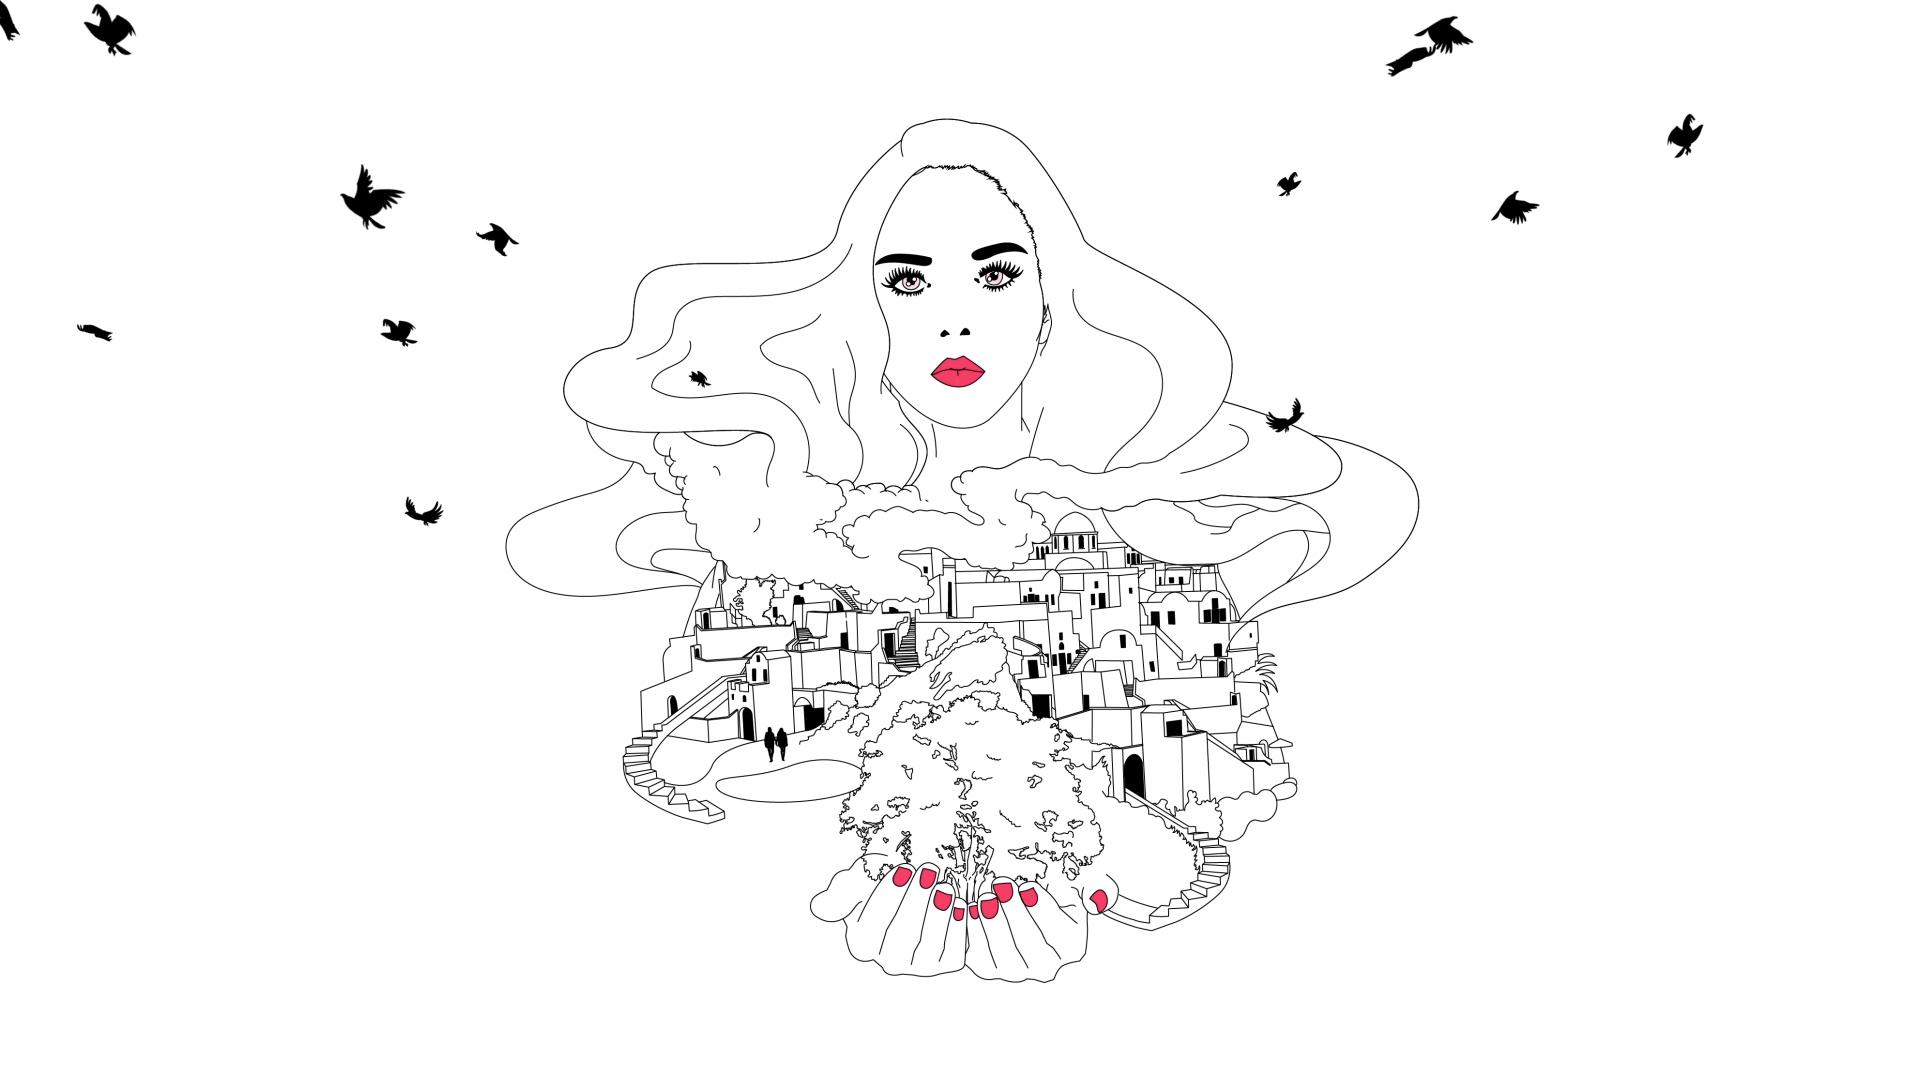 Animation by Xaviera Lopez